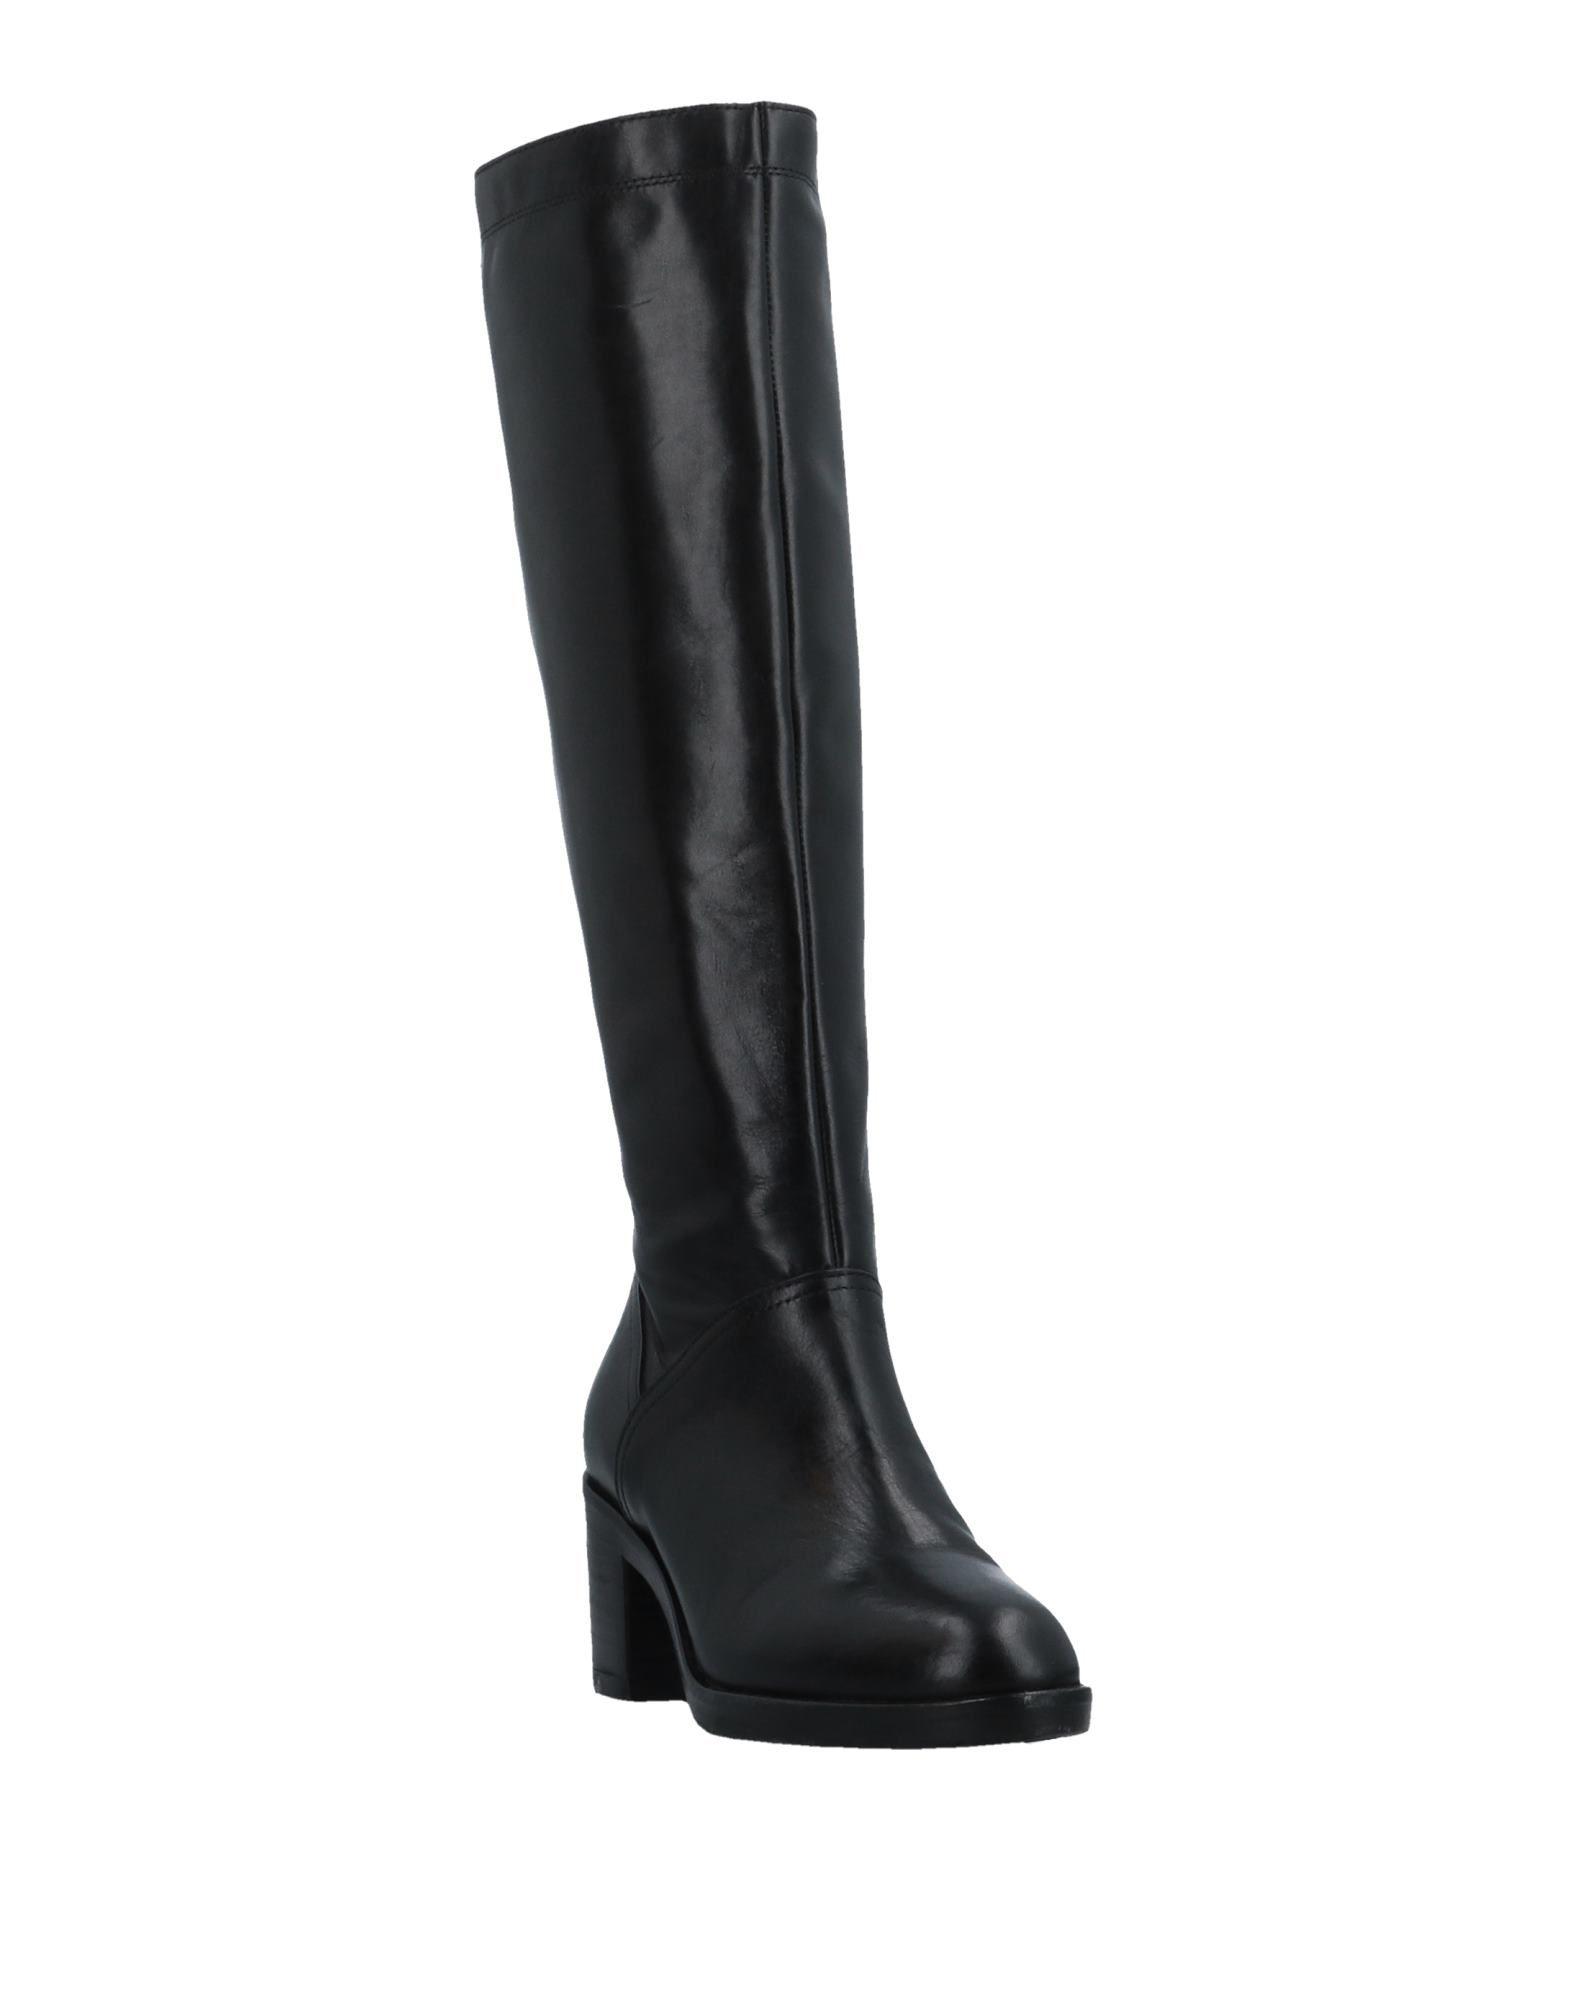 Stilvolle billige Schuhe Damen Bagatt Stiefel Damen Schuhe  11510681SJ 9e4b65